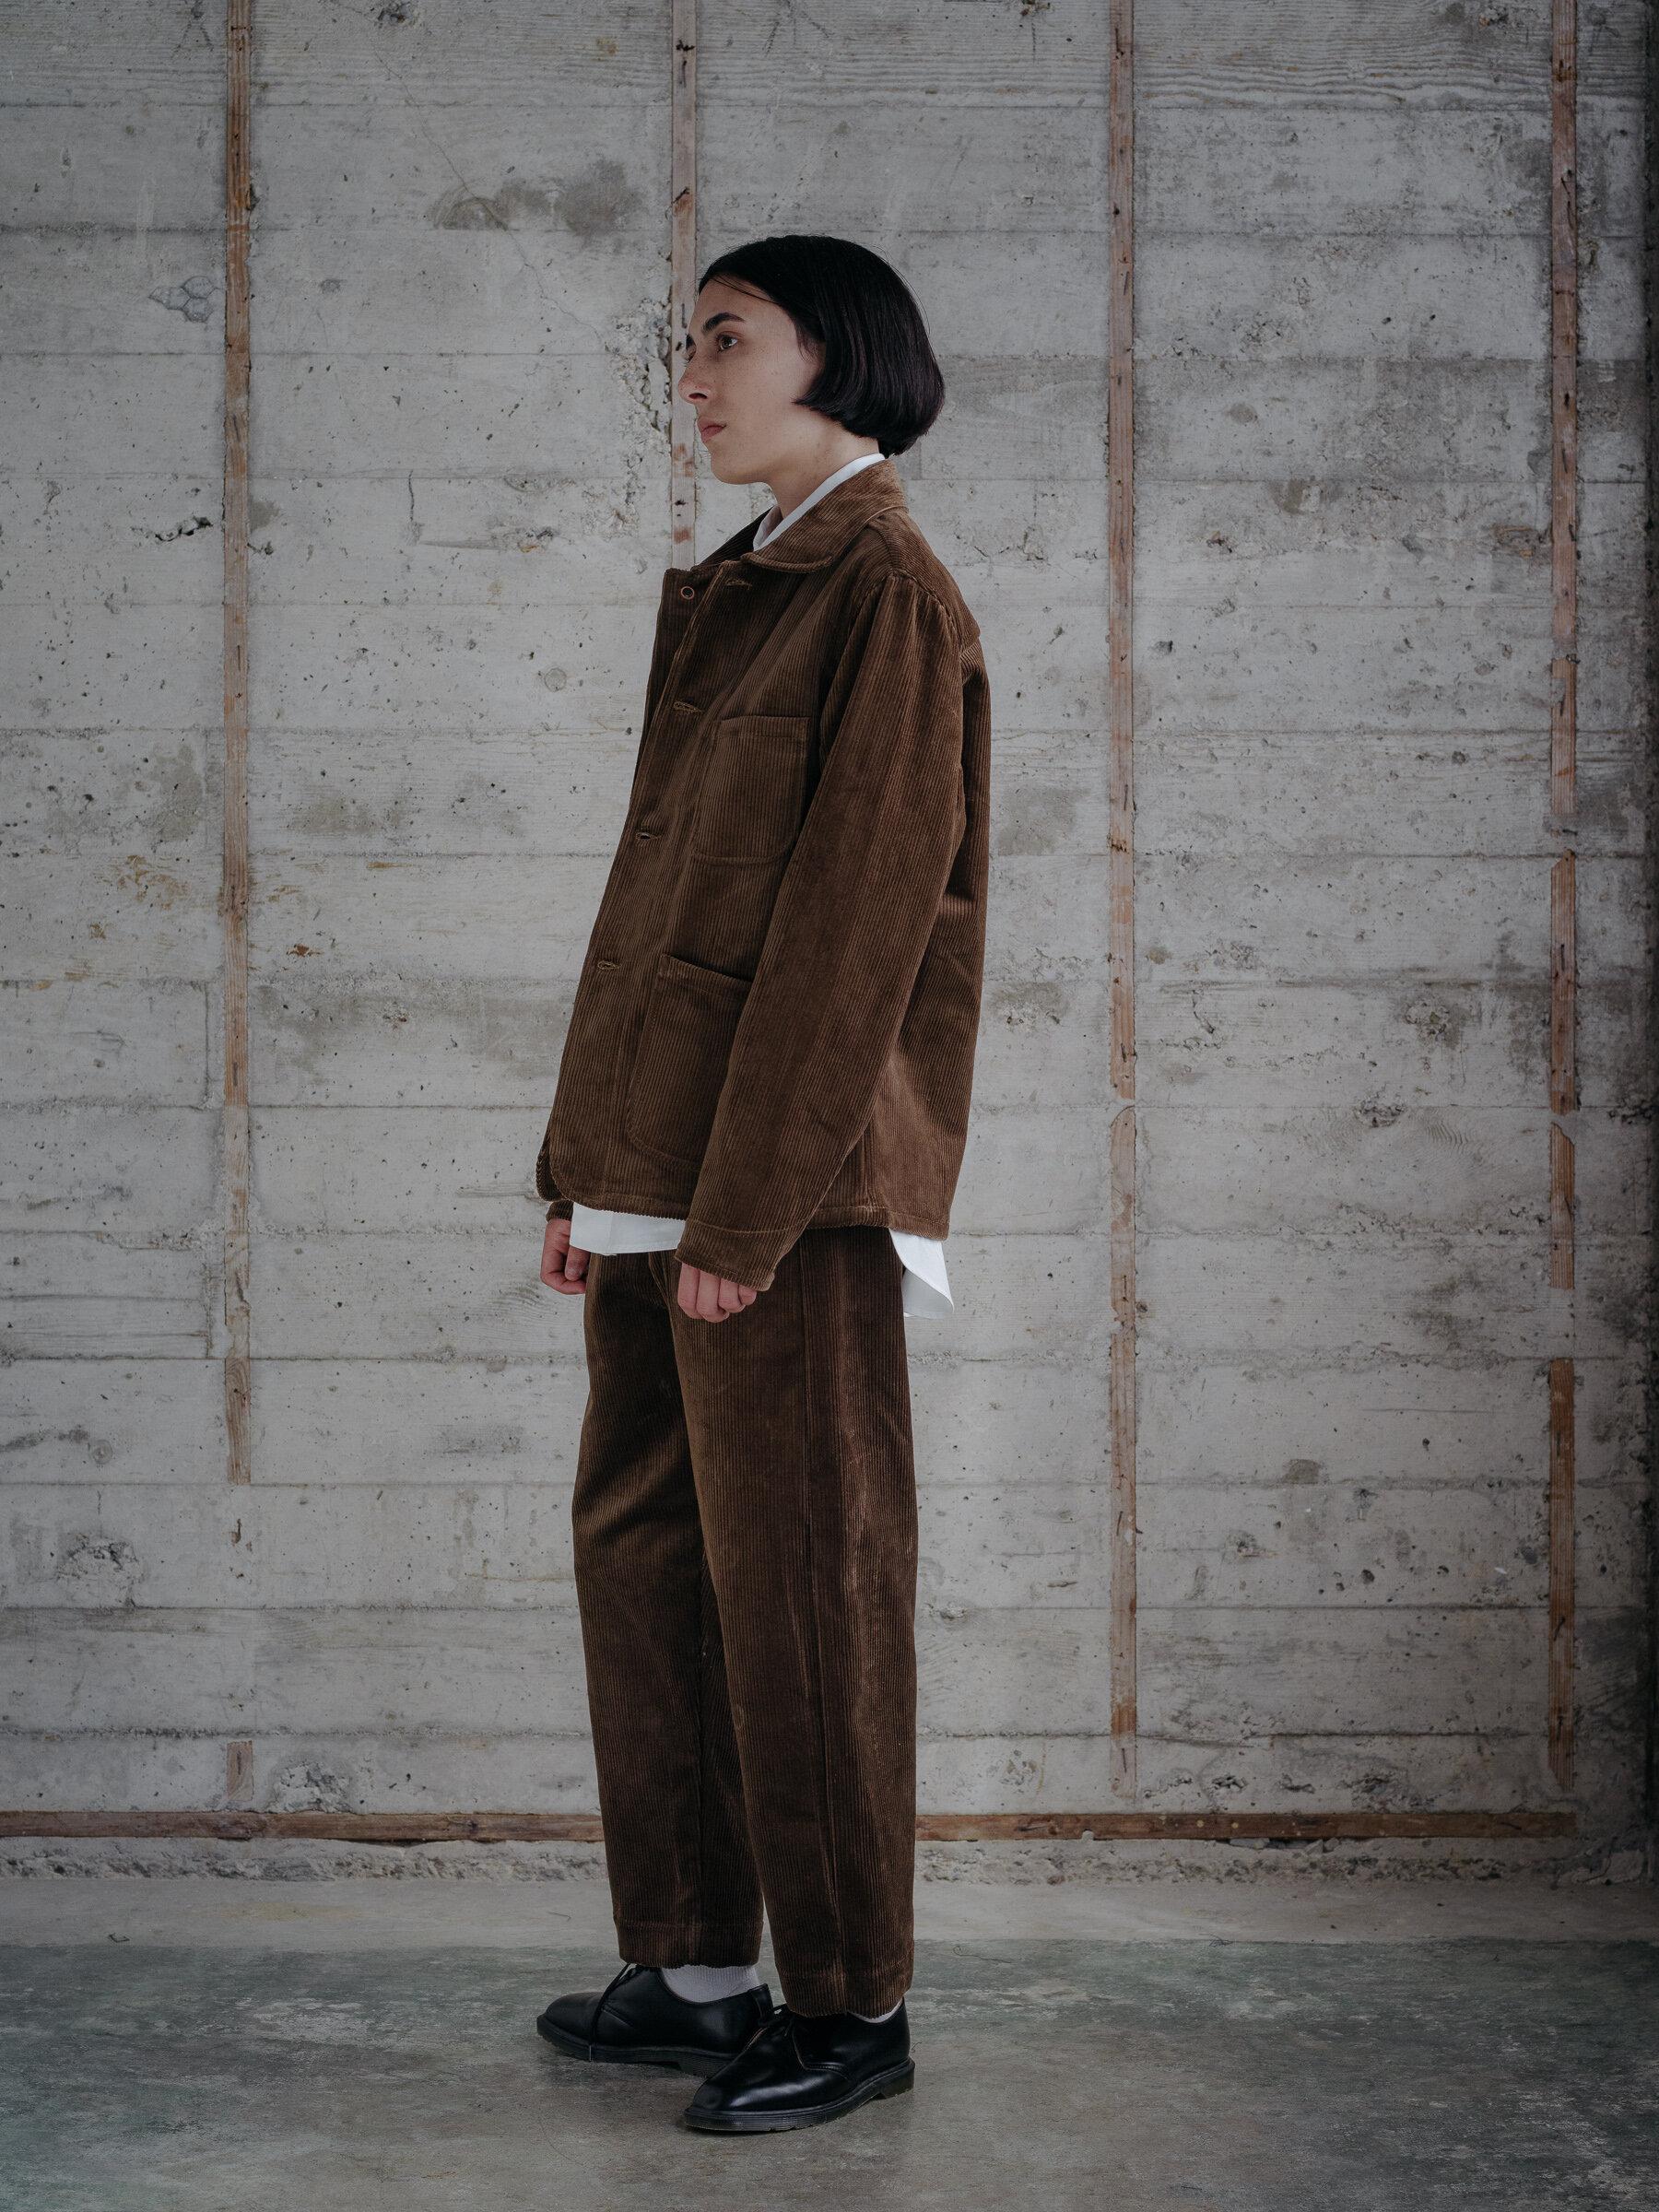 evan-kinori-three-pocket-jacket-organic-cotton-corduroy-woven-in-germany-10